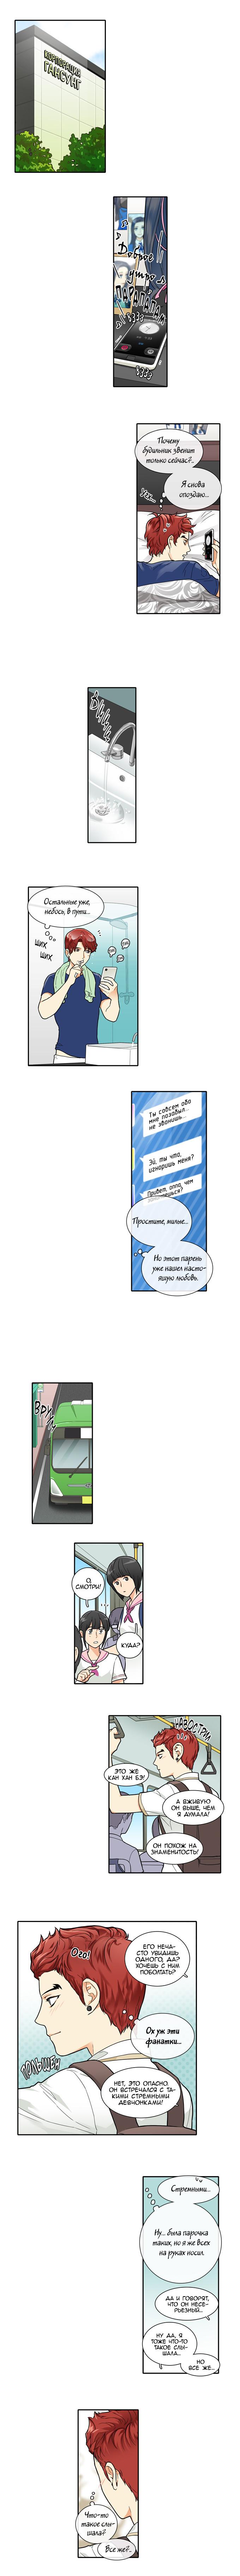 https://r1.ninemanga.com/comics/pic2/41/21609/269811/1438126148872.jpg Page 4